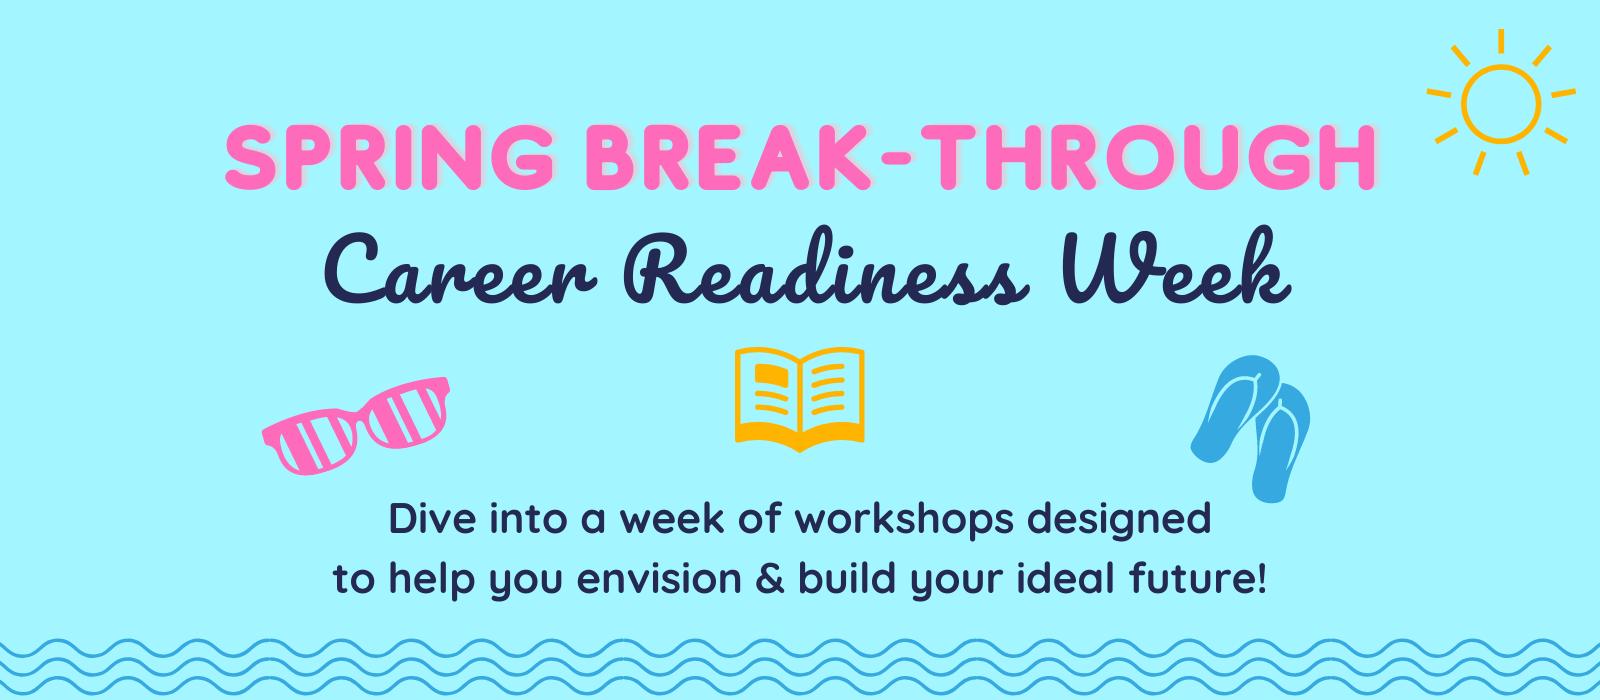 Spring Break-Through: Career Readiness Week main event series image